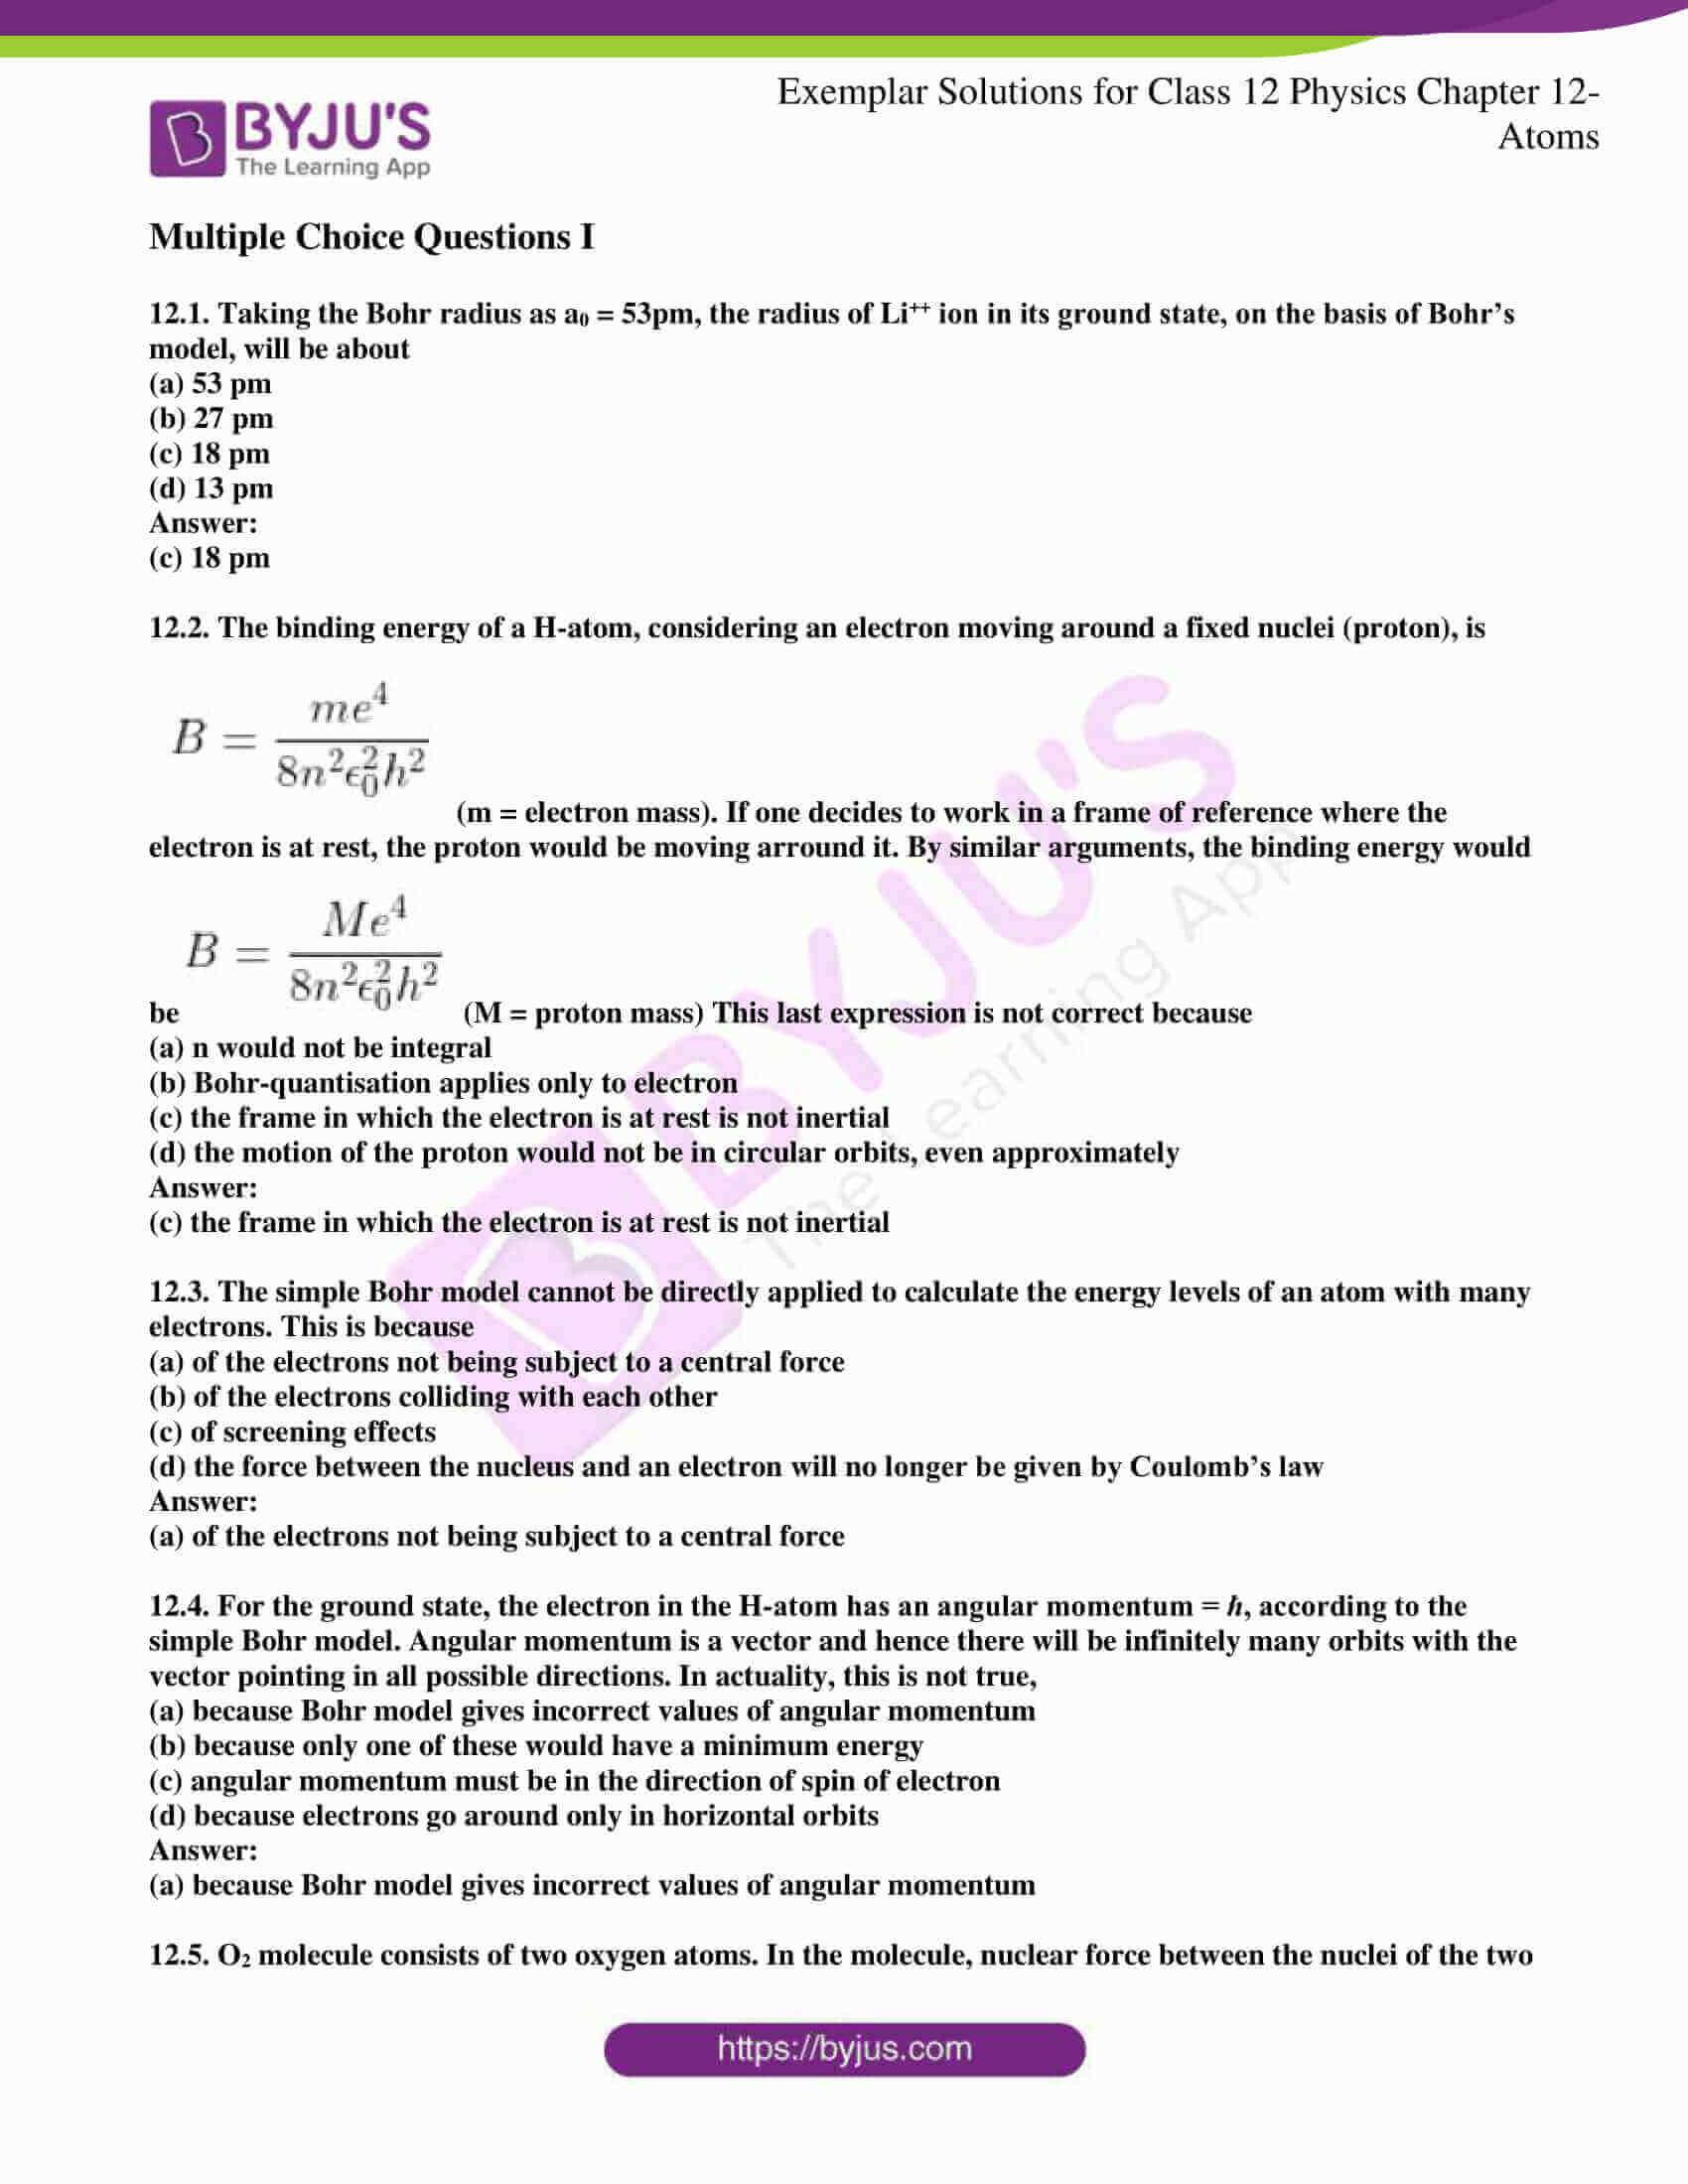 ncert exemplar solutions for class 12 physics chapter 12 1